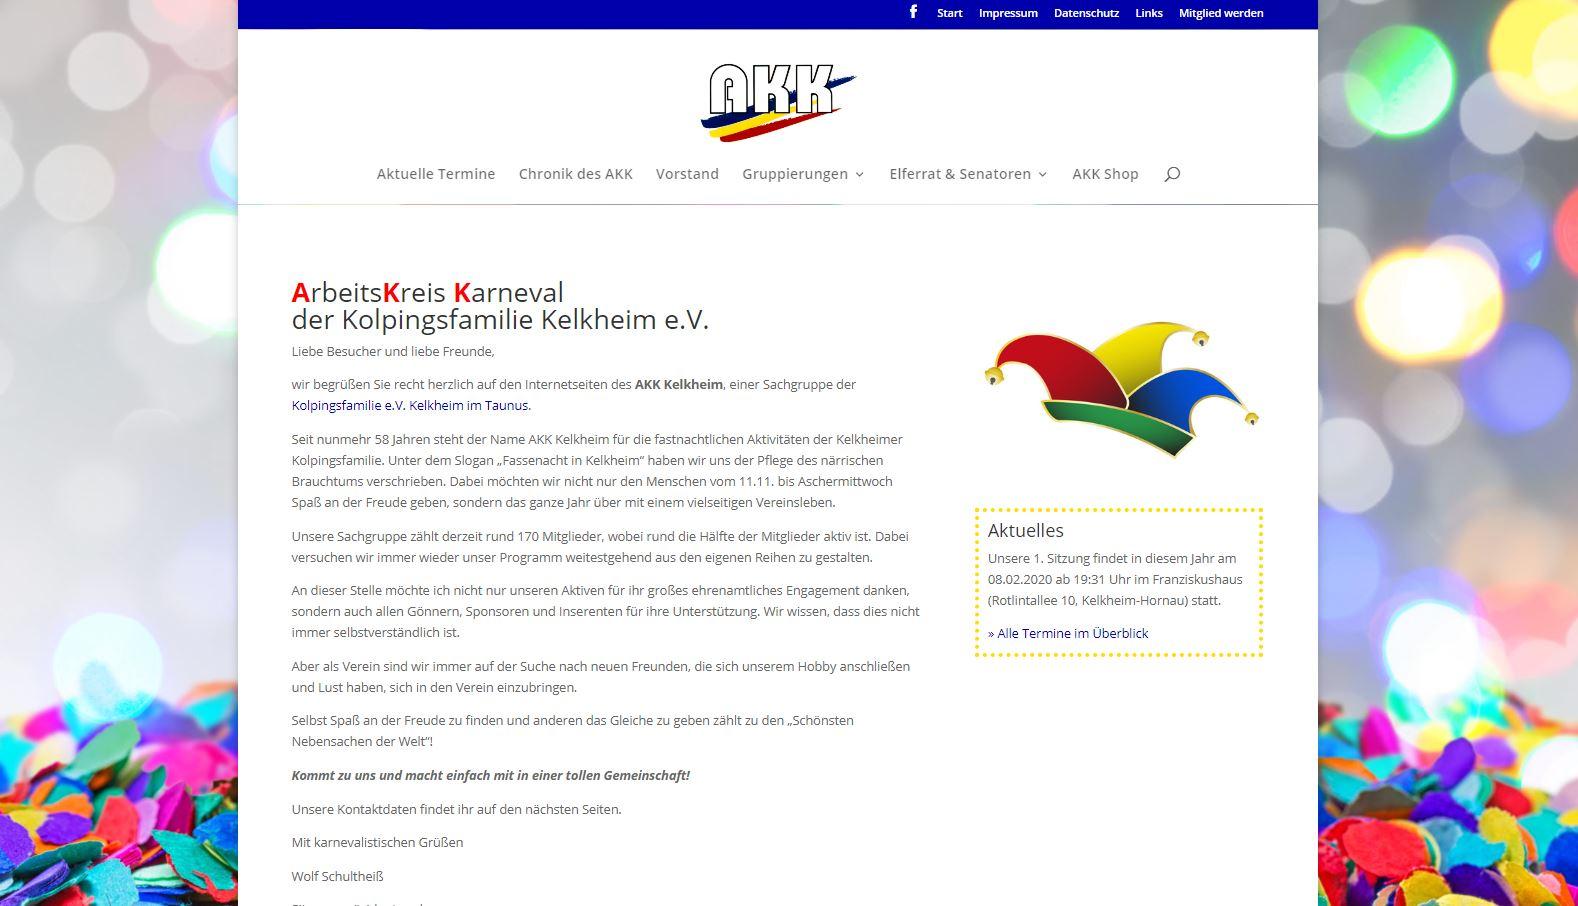 Website des AKK Kelkheim seit 2020